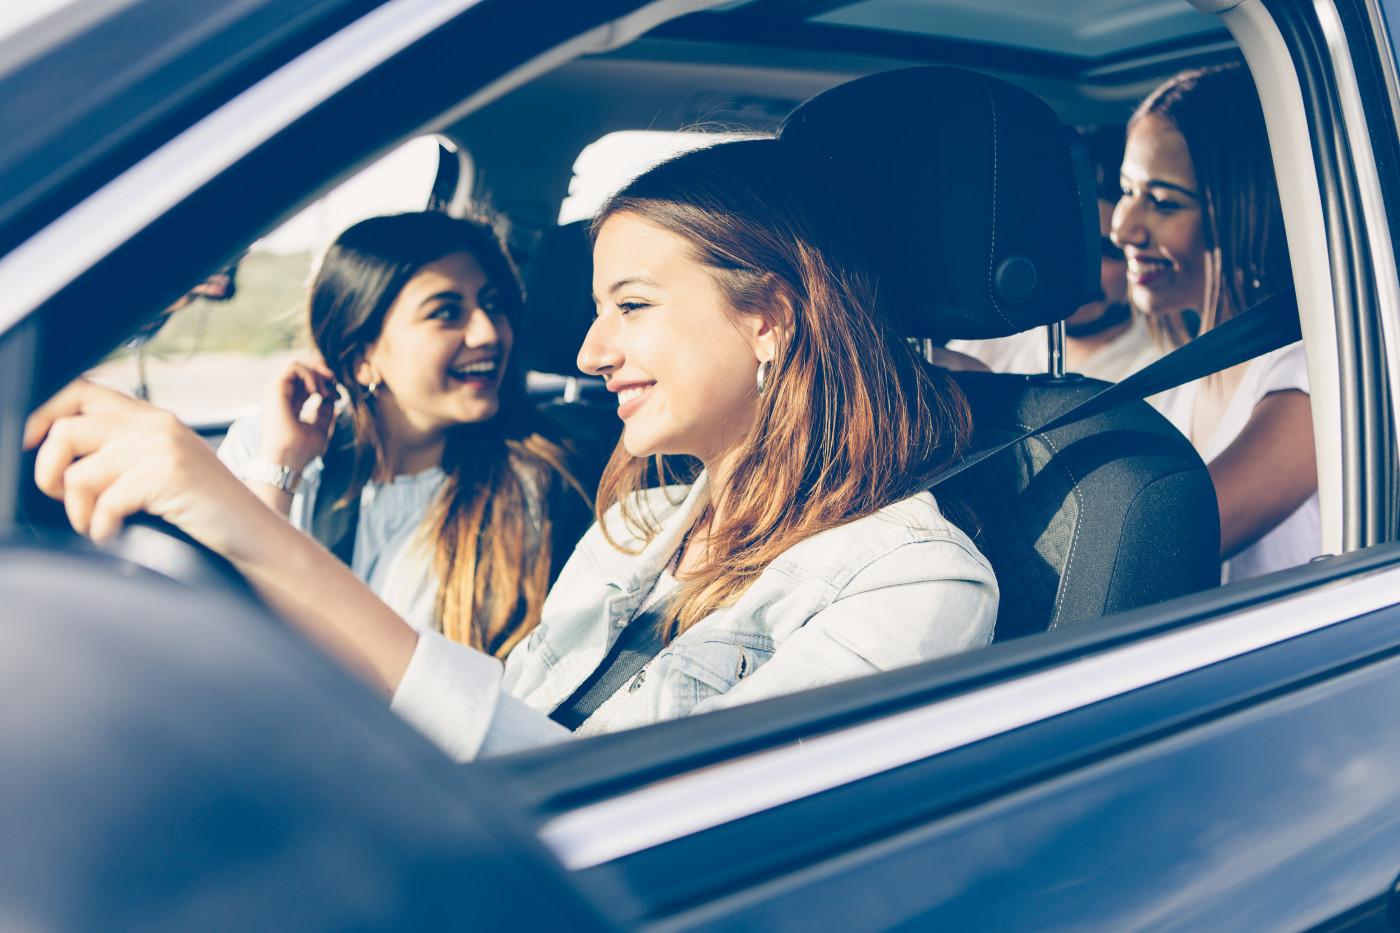 teenagers in car smiling